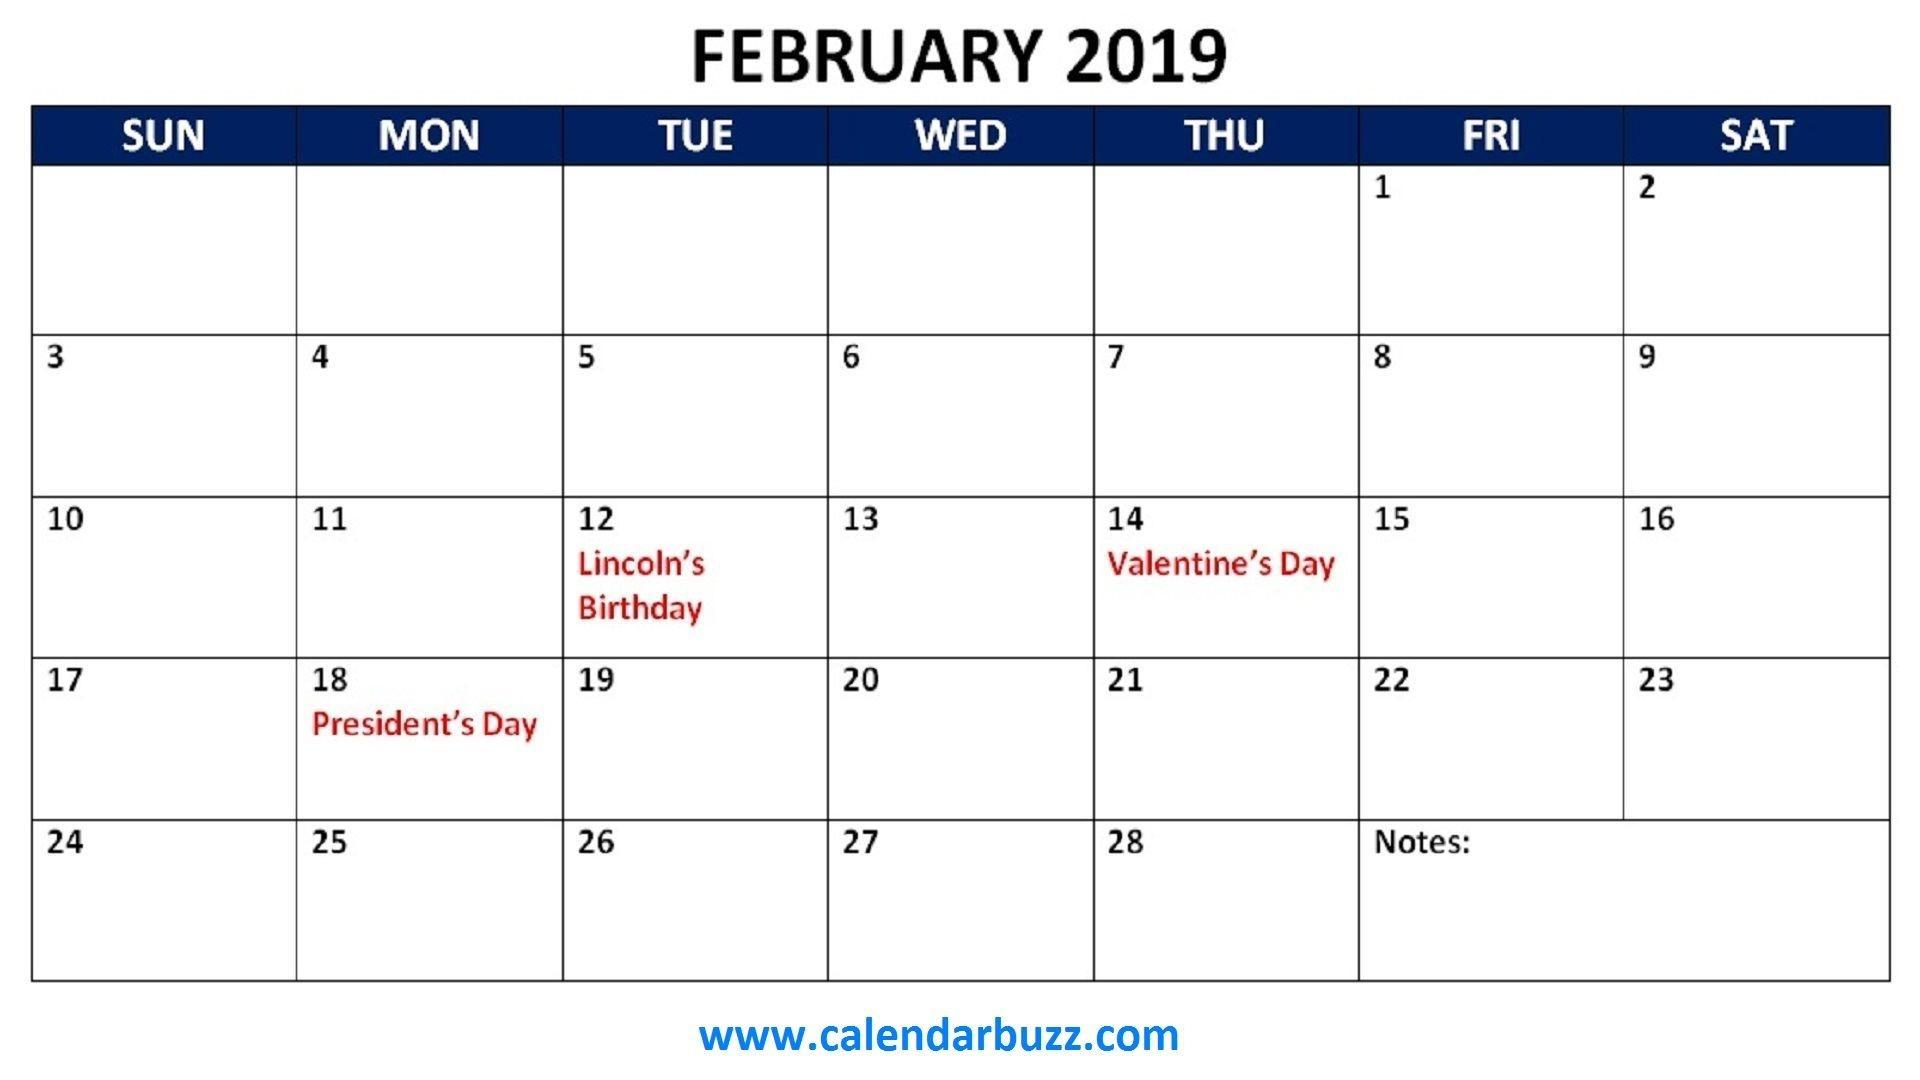 February Calendar 2019 Printable With Holidays